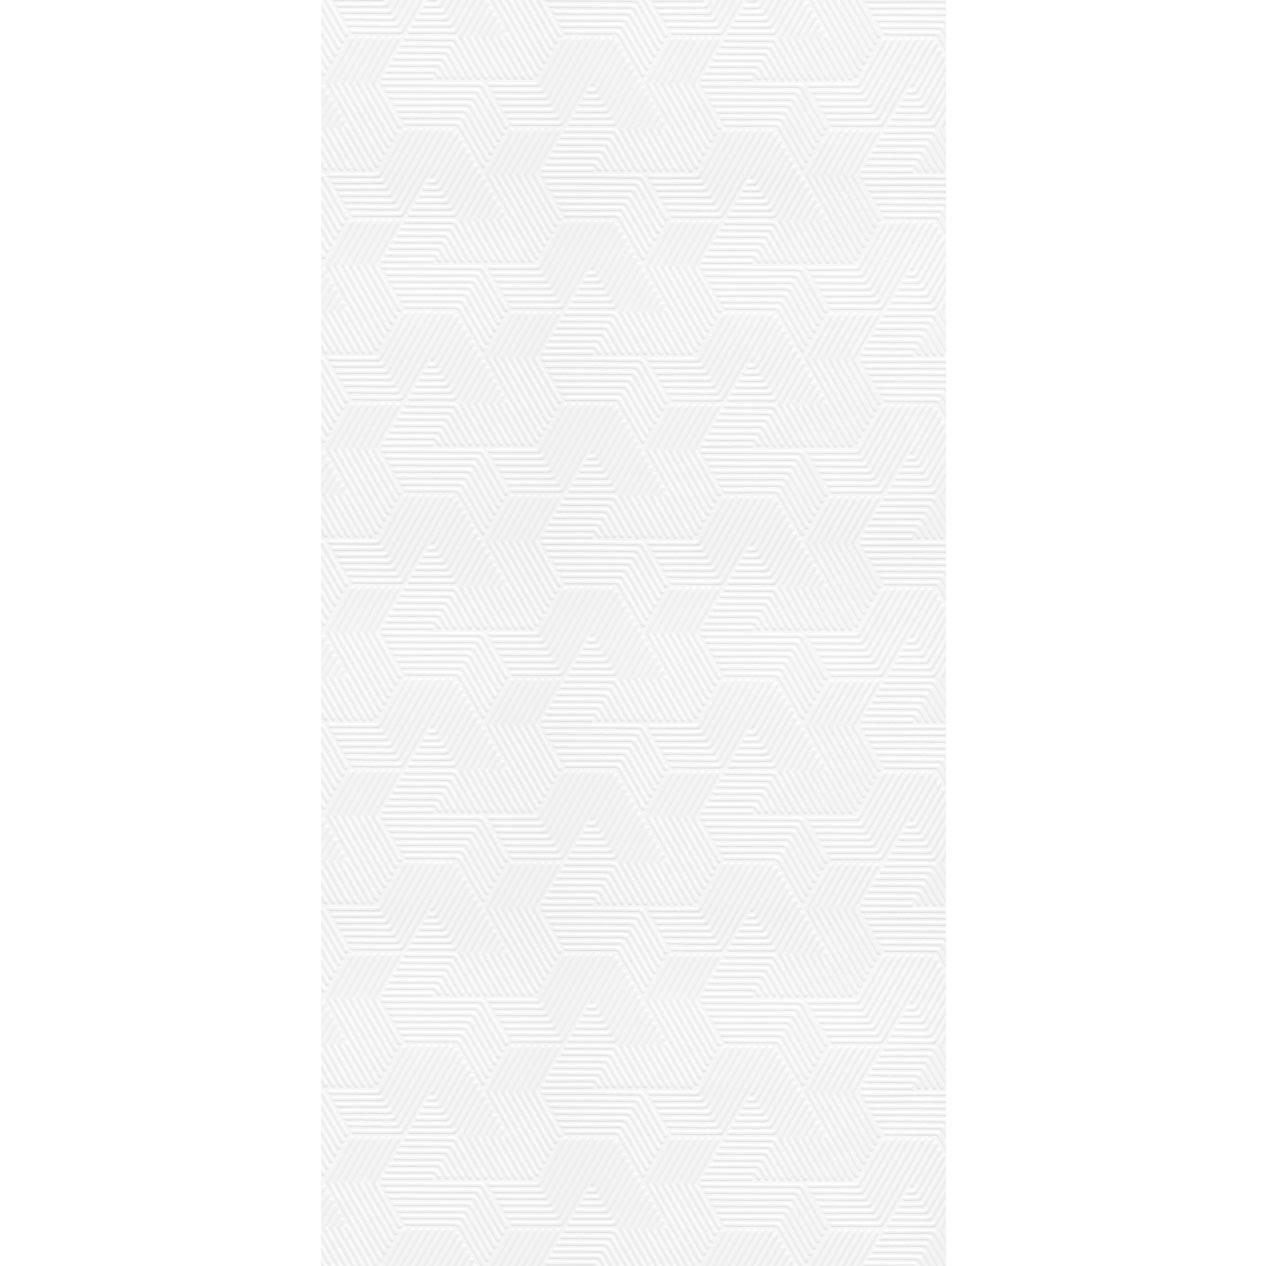 Revestimento Escaleno Gloss Brilhante 45x90cm Branco - Eliane